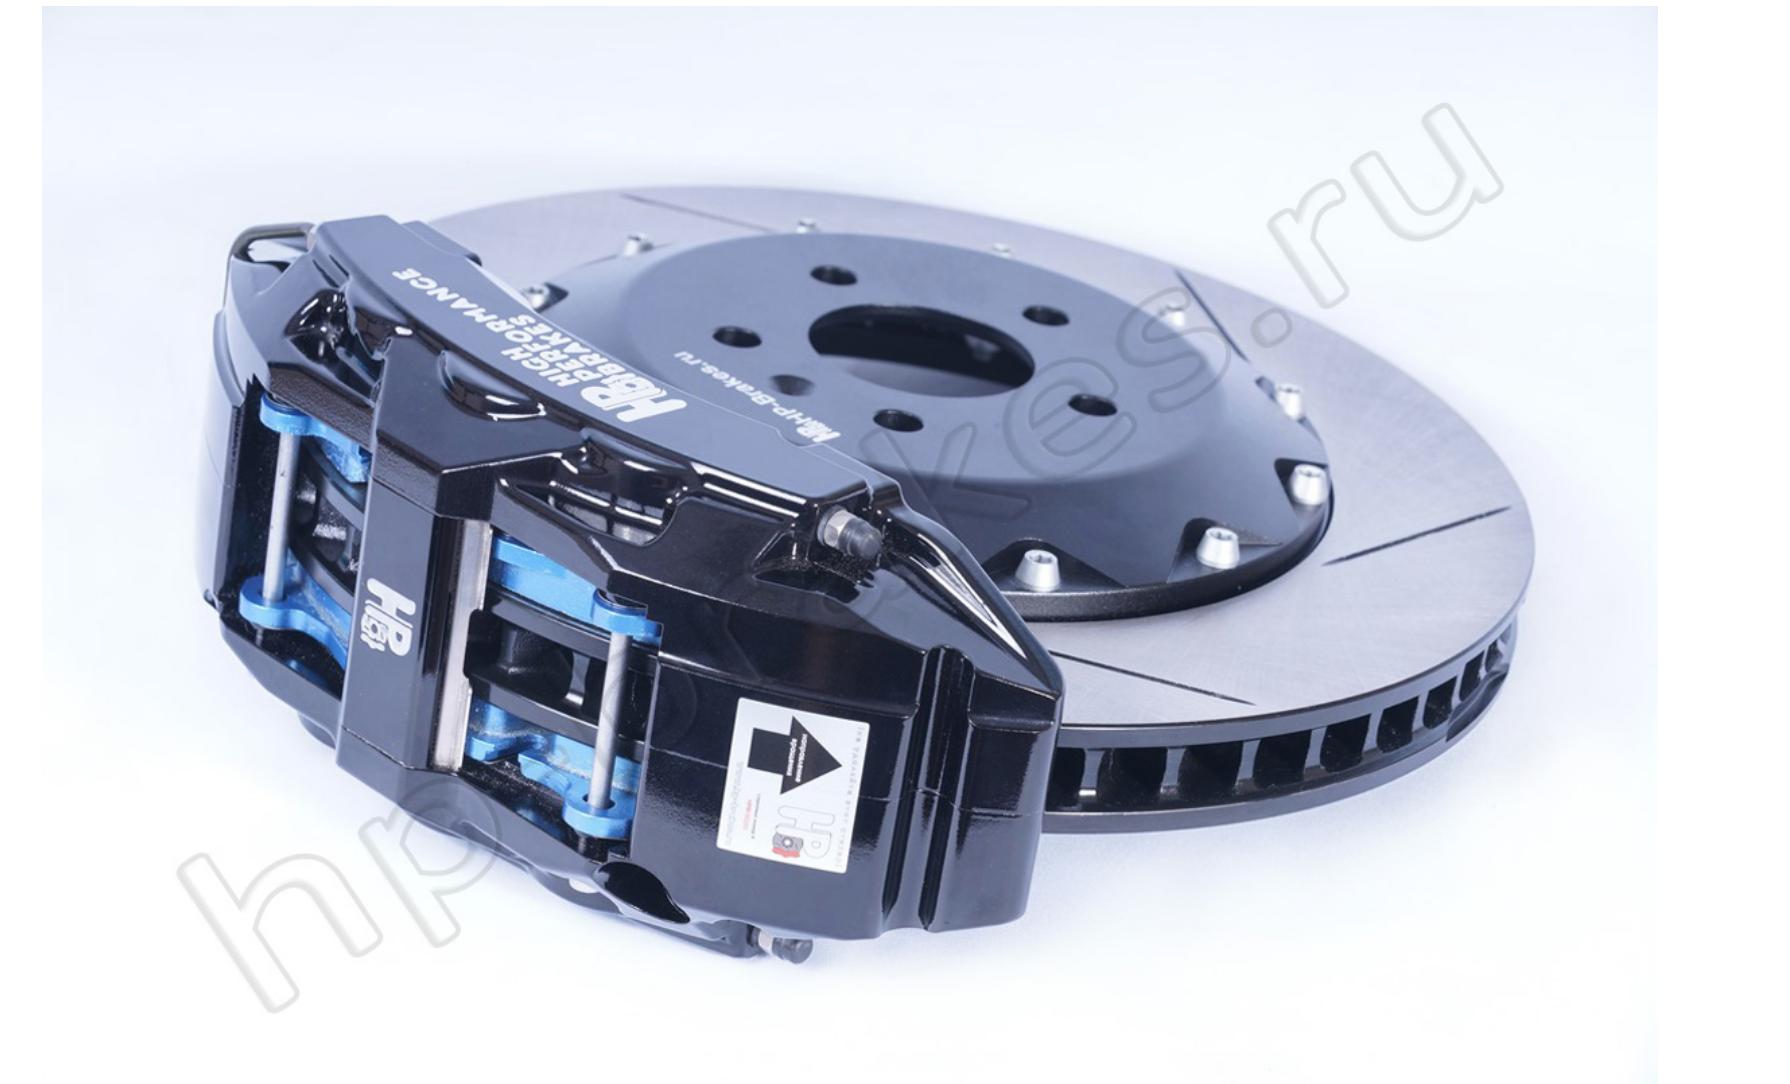 Тормозная система HP Brakes (Передняя ось, D18, 6 поршней, диск 365х34мм)